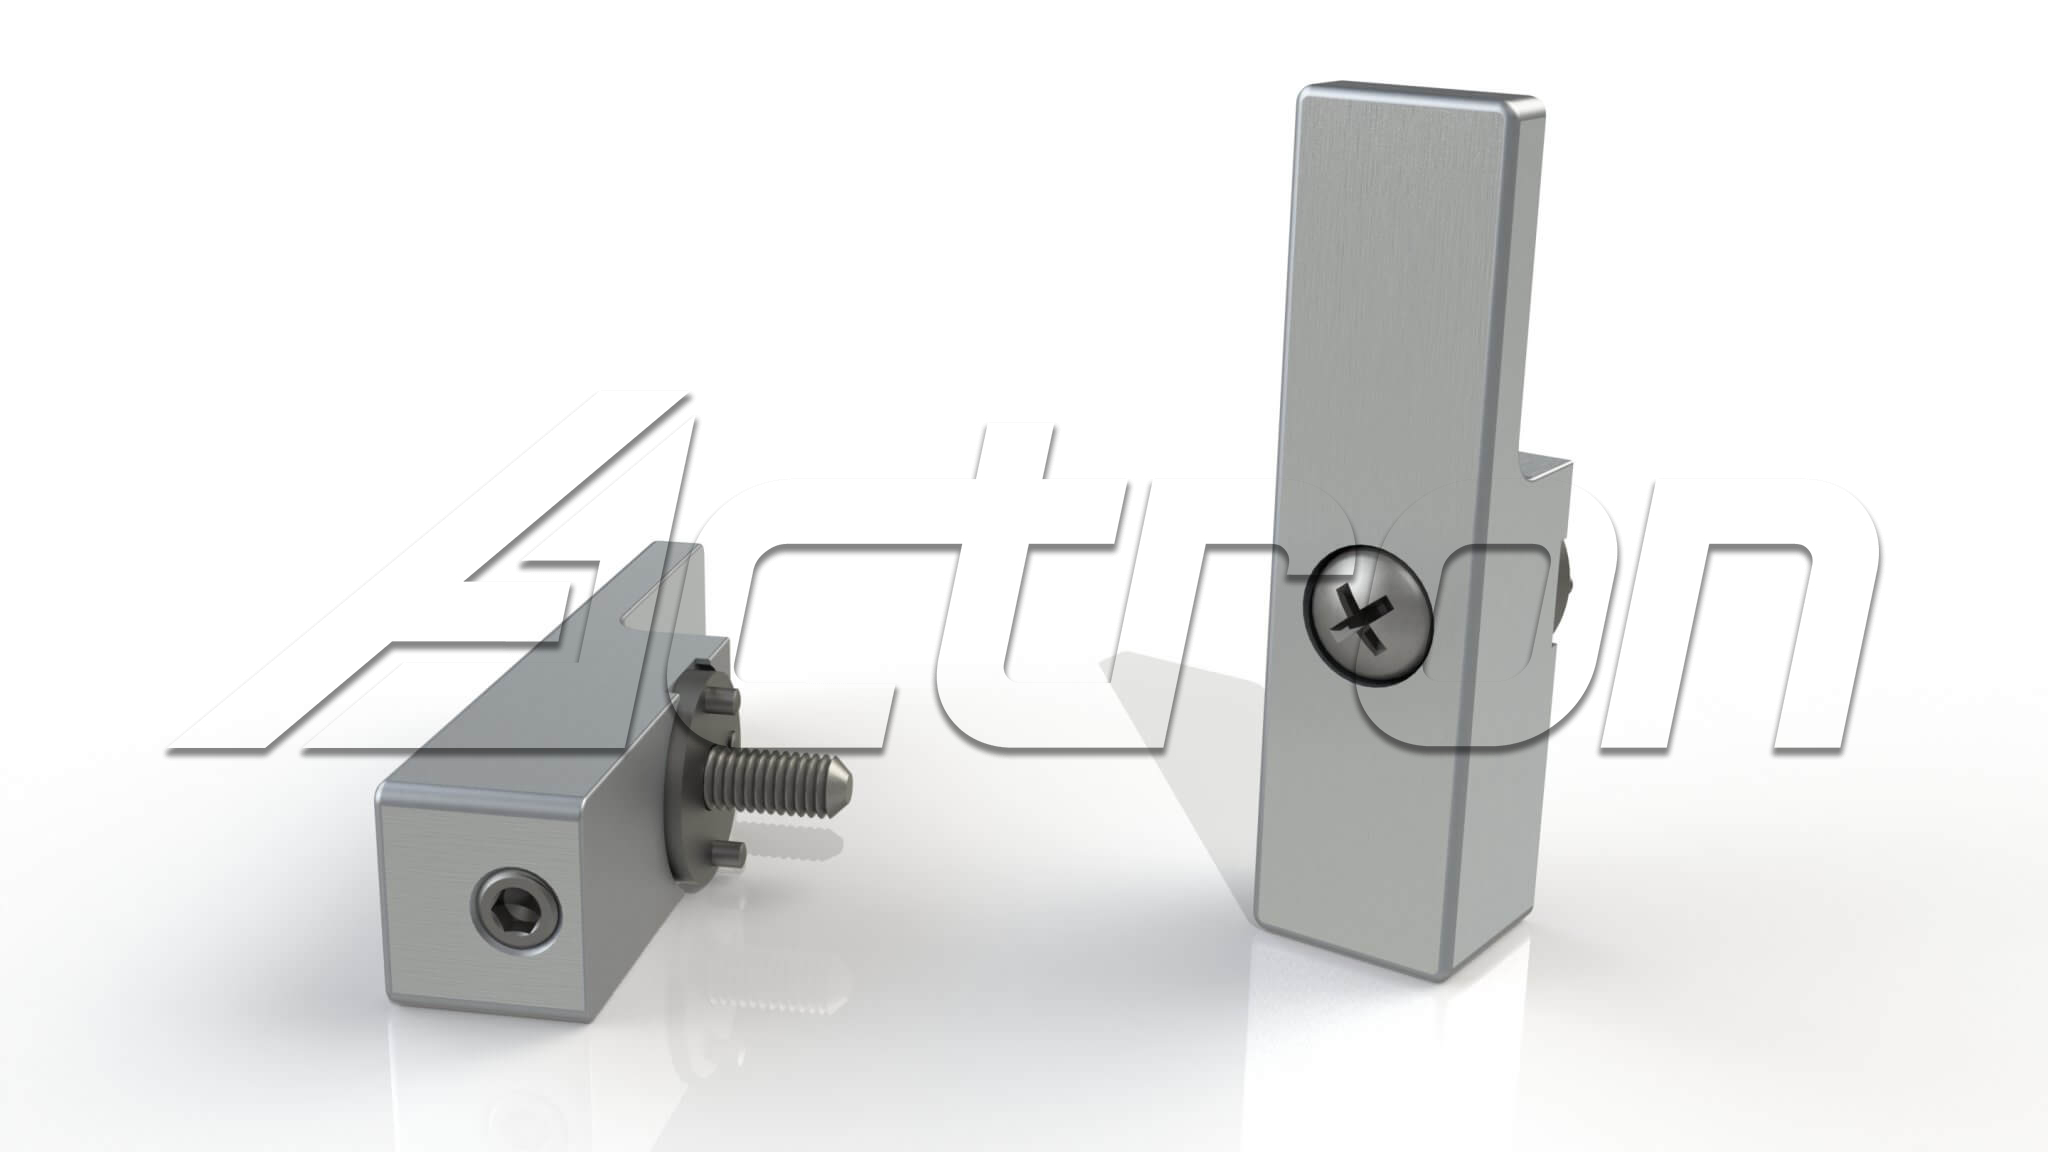 1-4-turn-retainer-4610-a35590.jpg